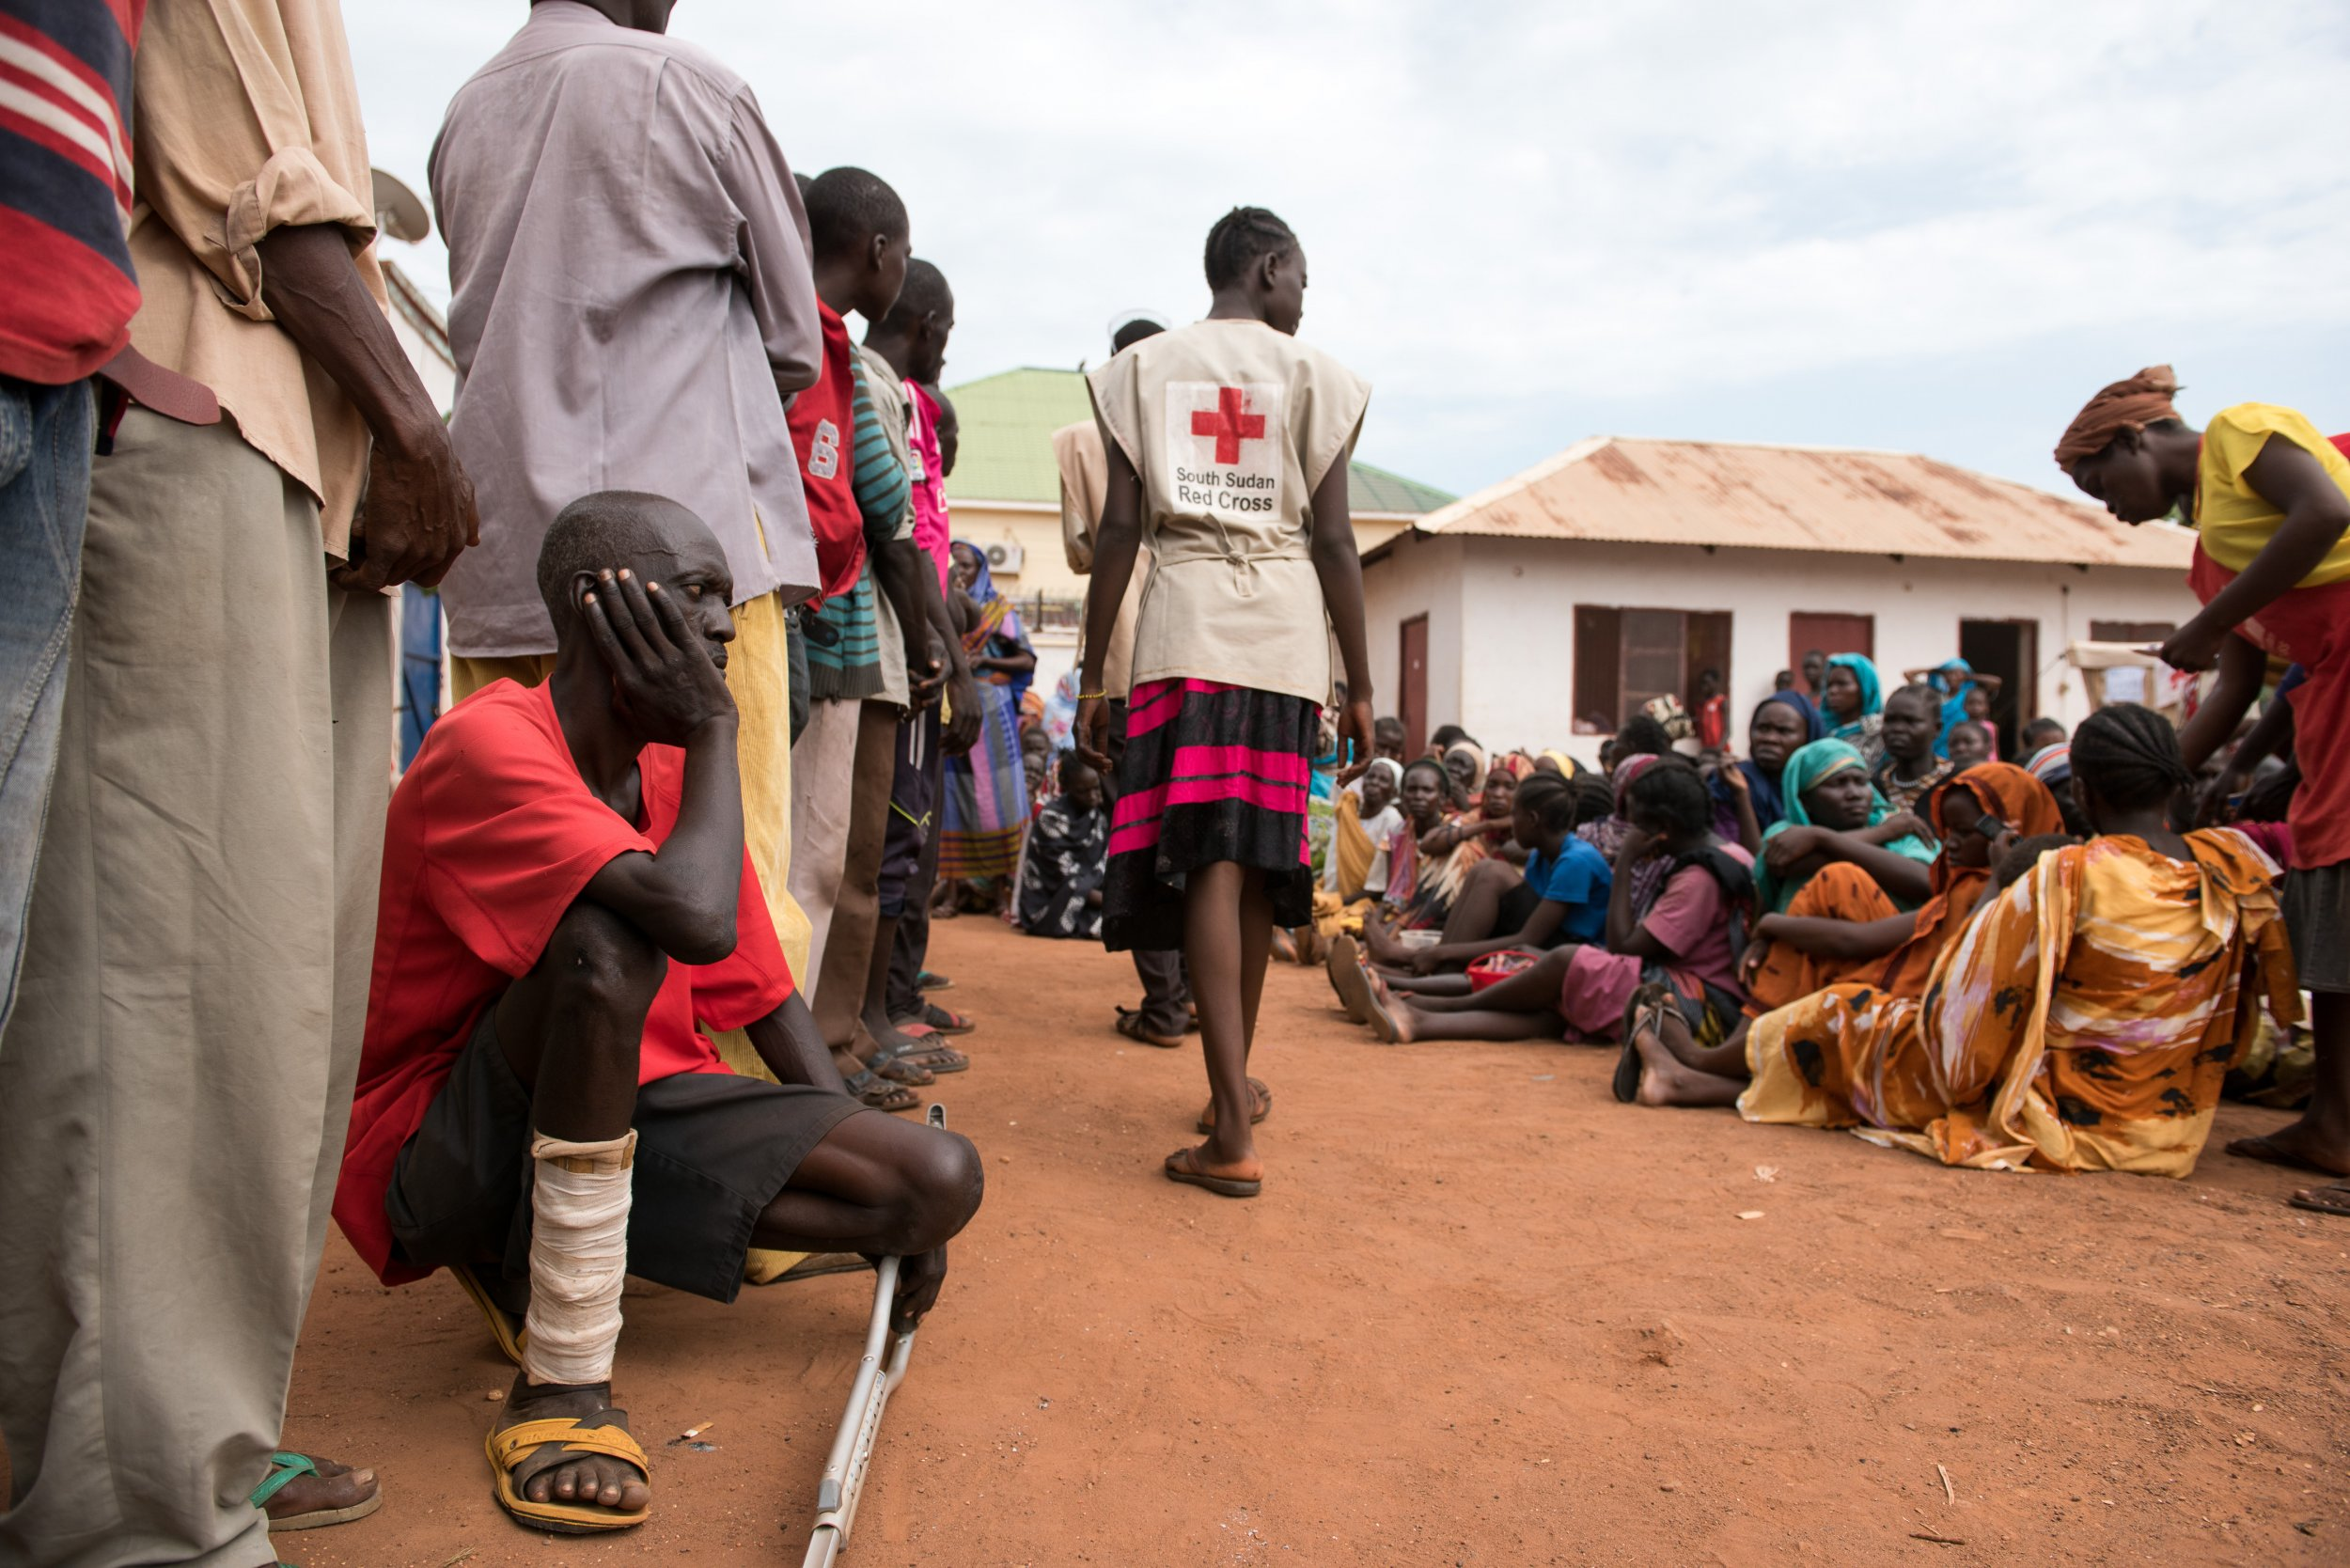 South Sudan Red Cross